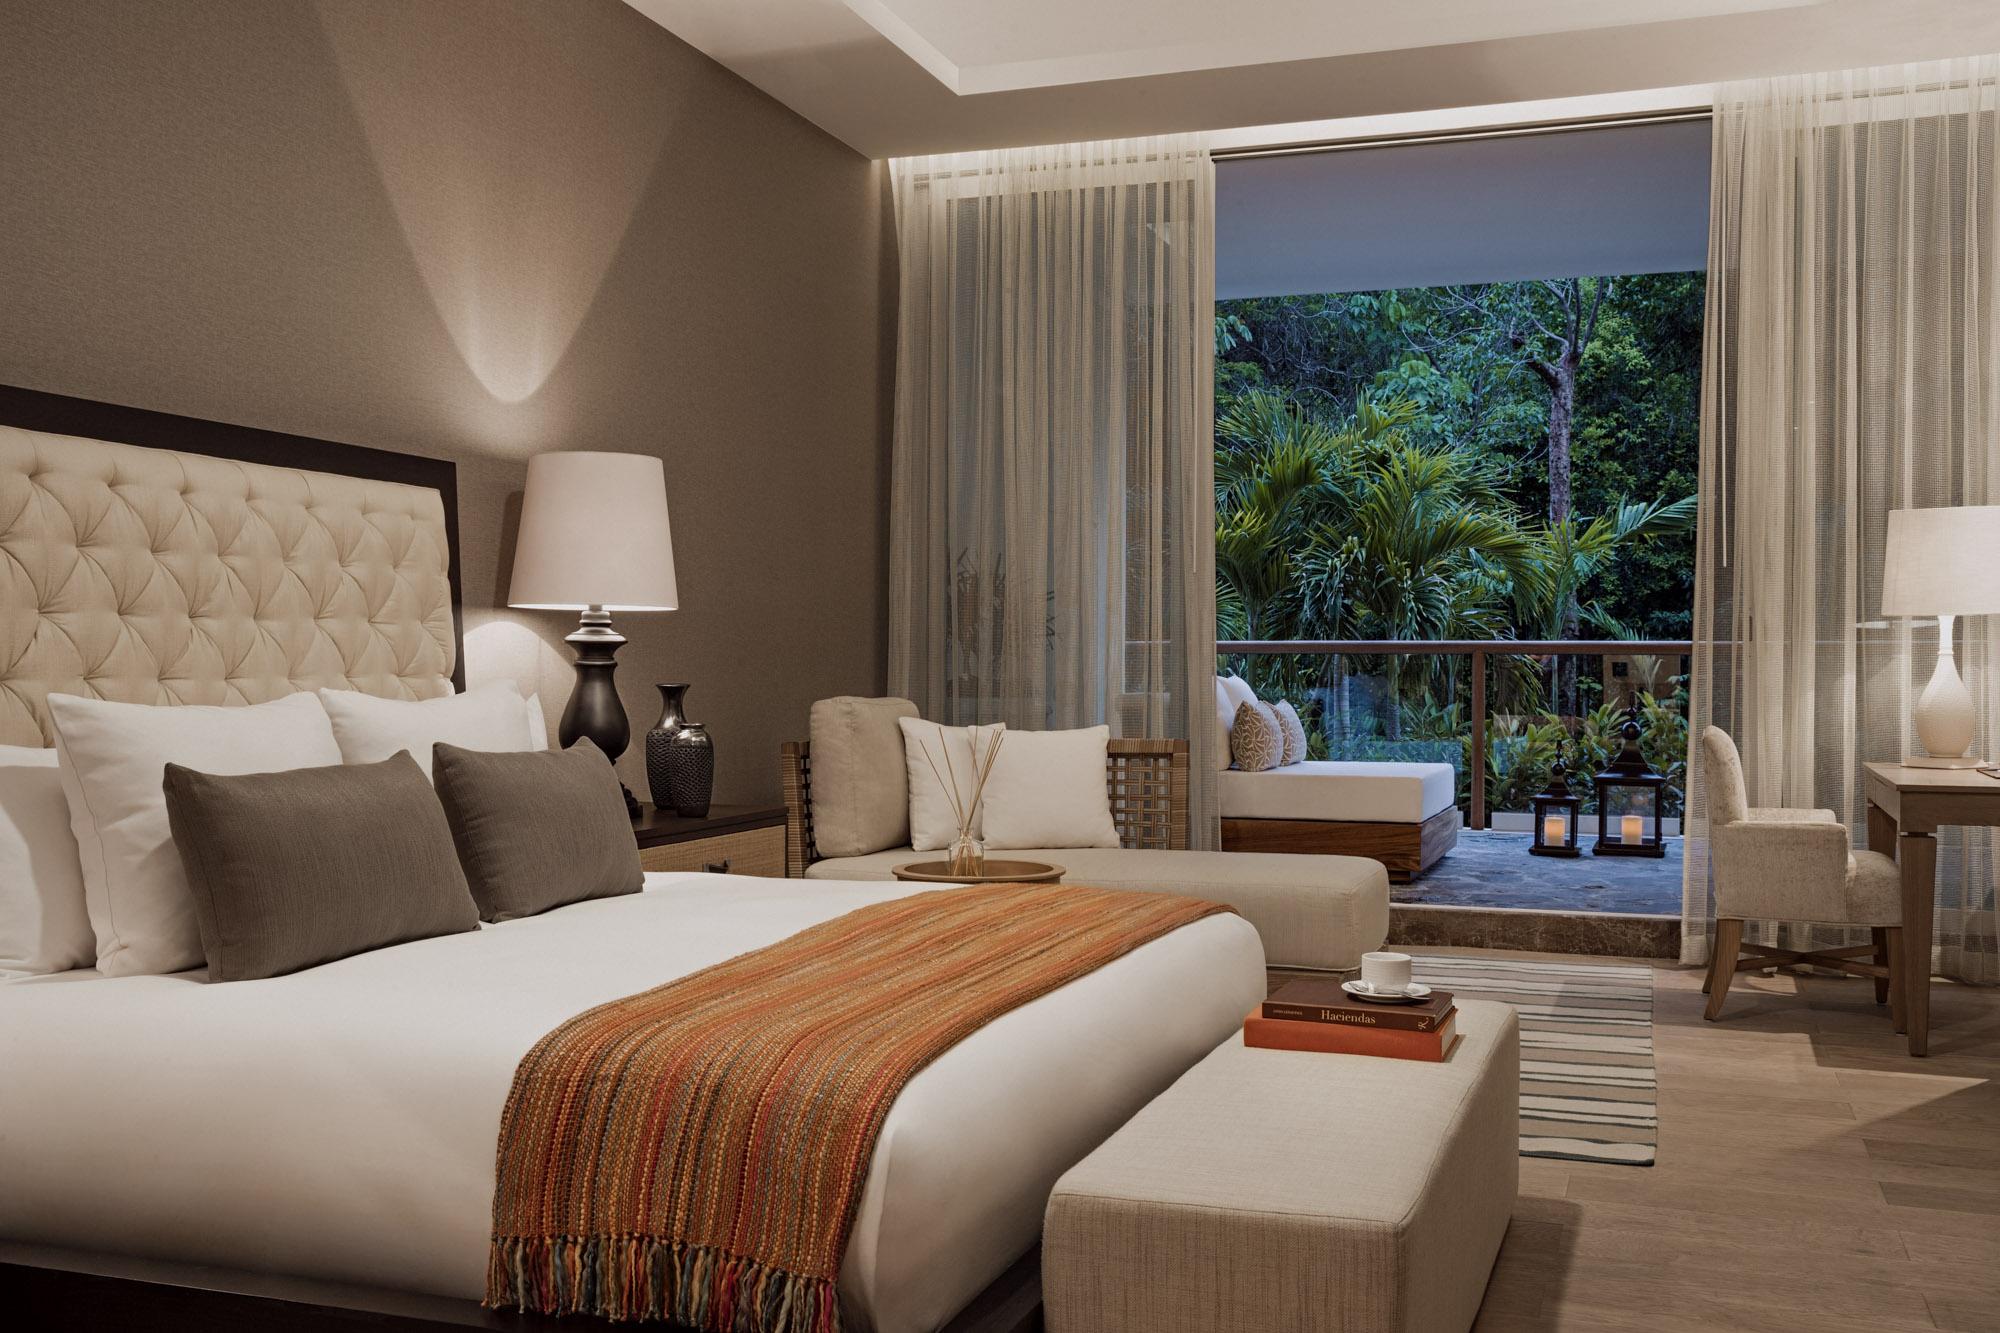 RM_GL_4Bed_Guest_Bedroom_0824_FINAL_Medium.jpg